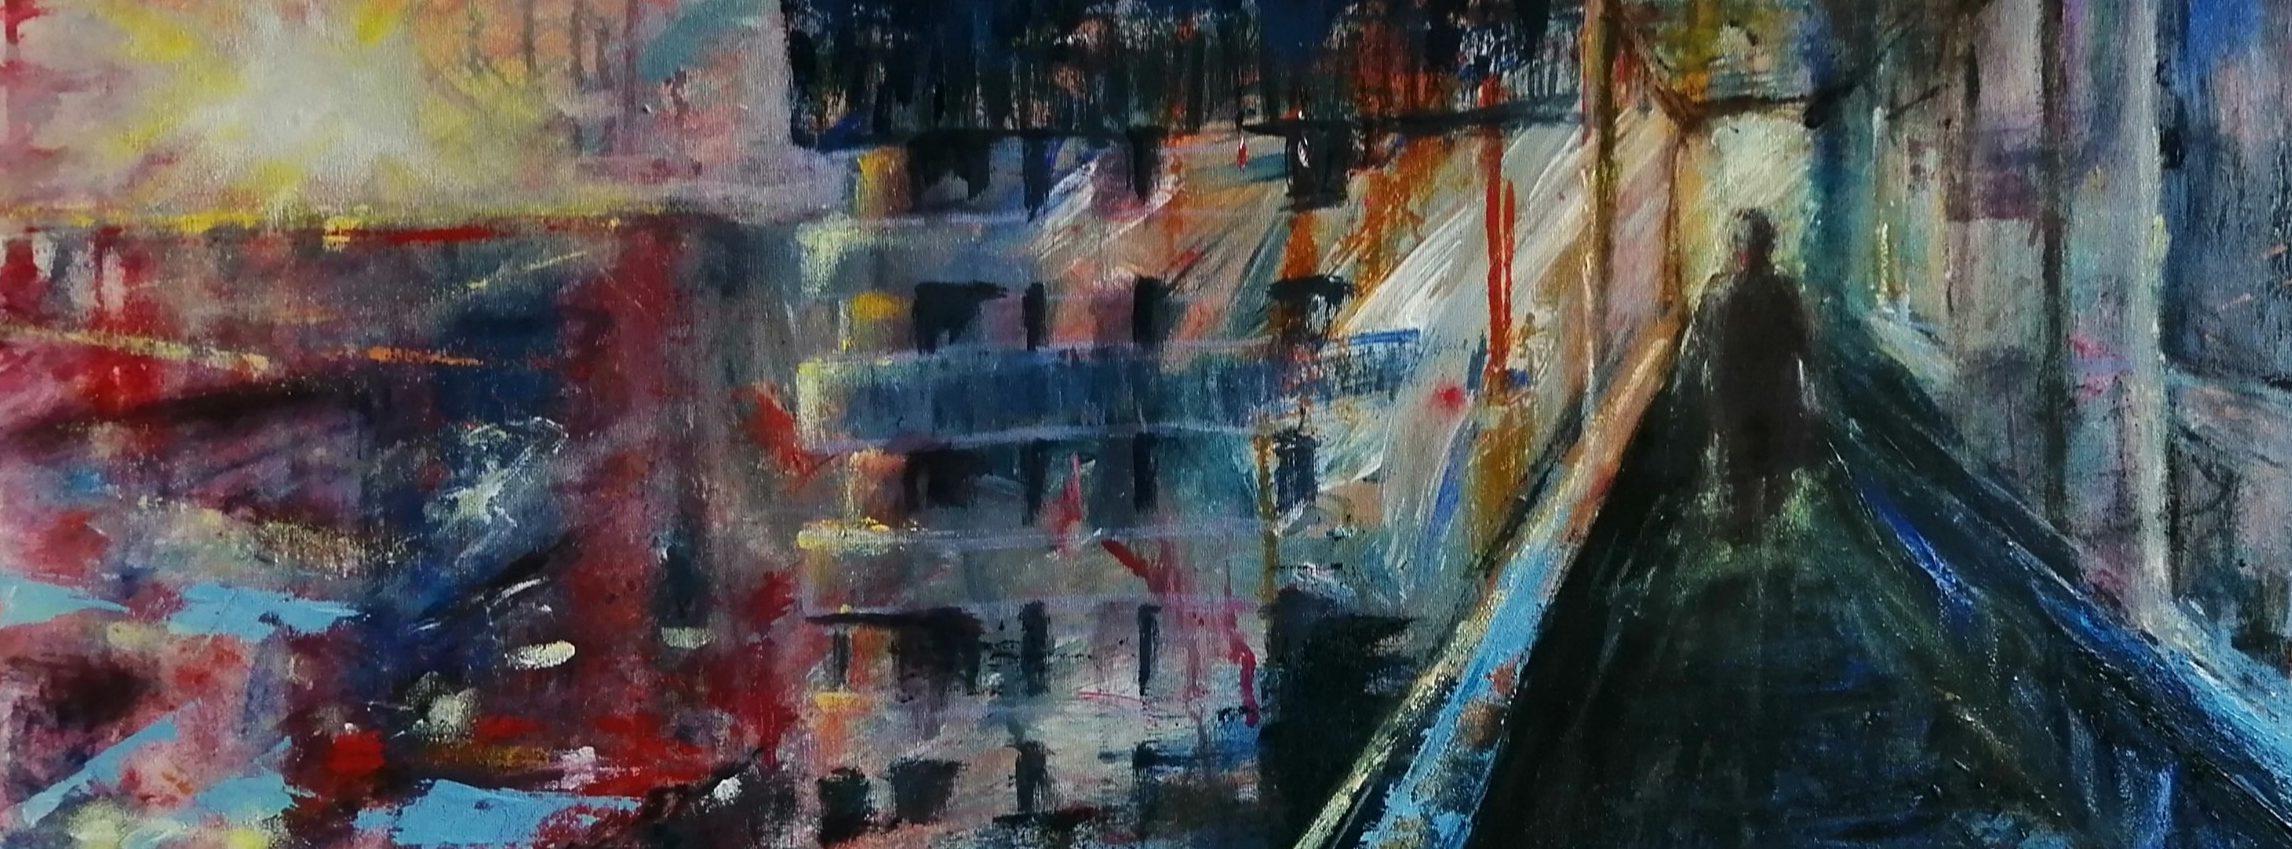 Lindsay Anderson_Art